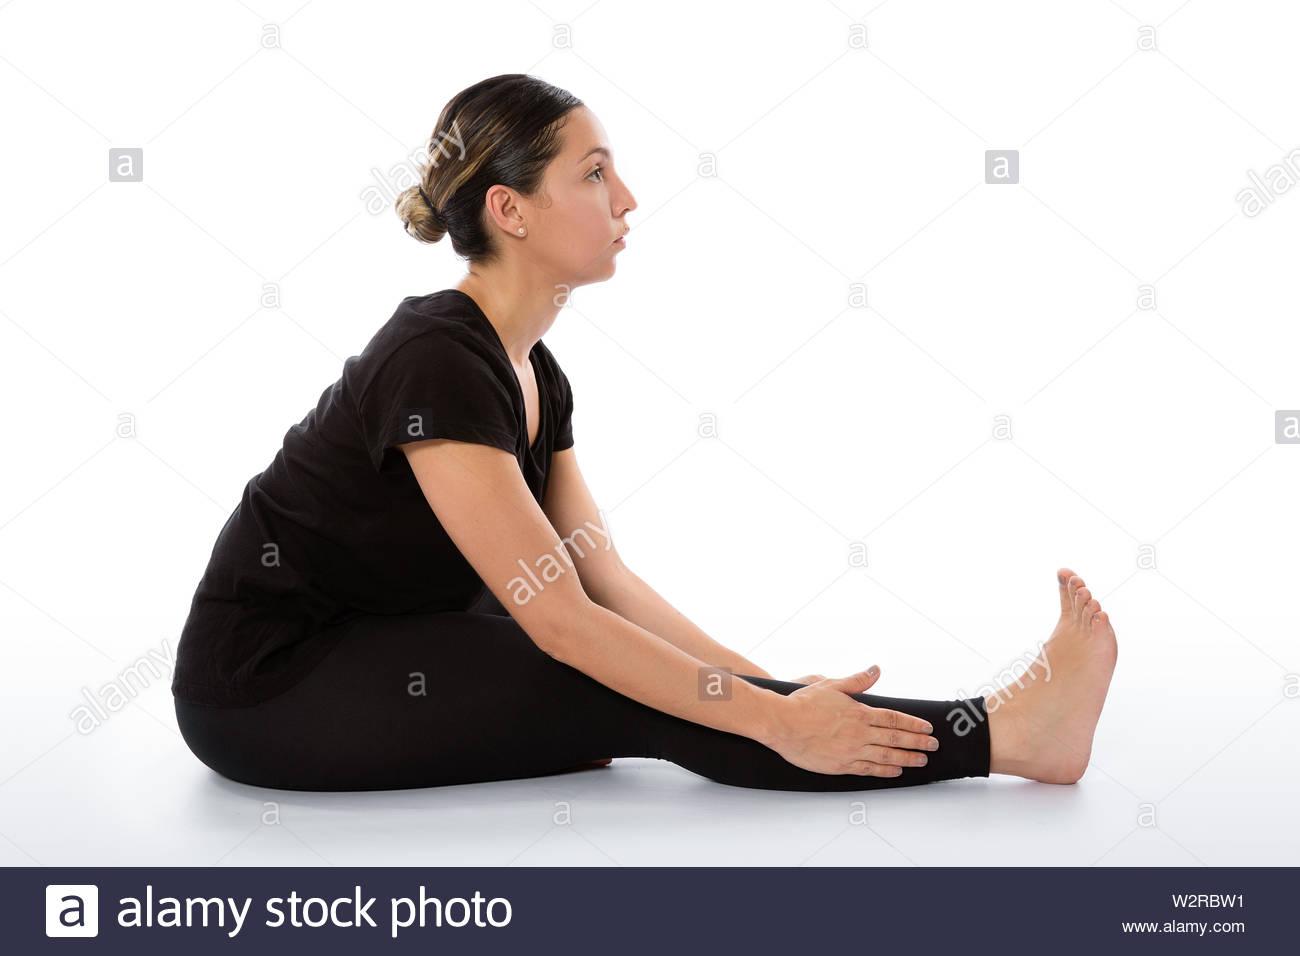 Paschimottanasana yoga pose (Seated Forward Bend pose). Yoga poses woman isolated with white background. Yoga pose set. Mindfulness and Spiritually co - Stock Image